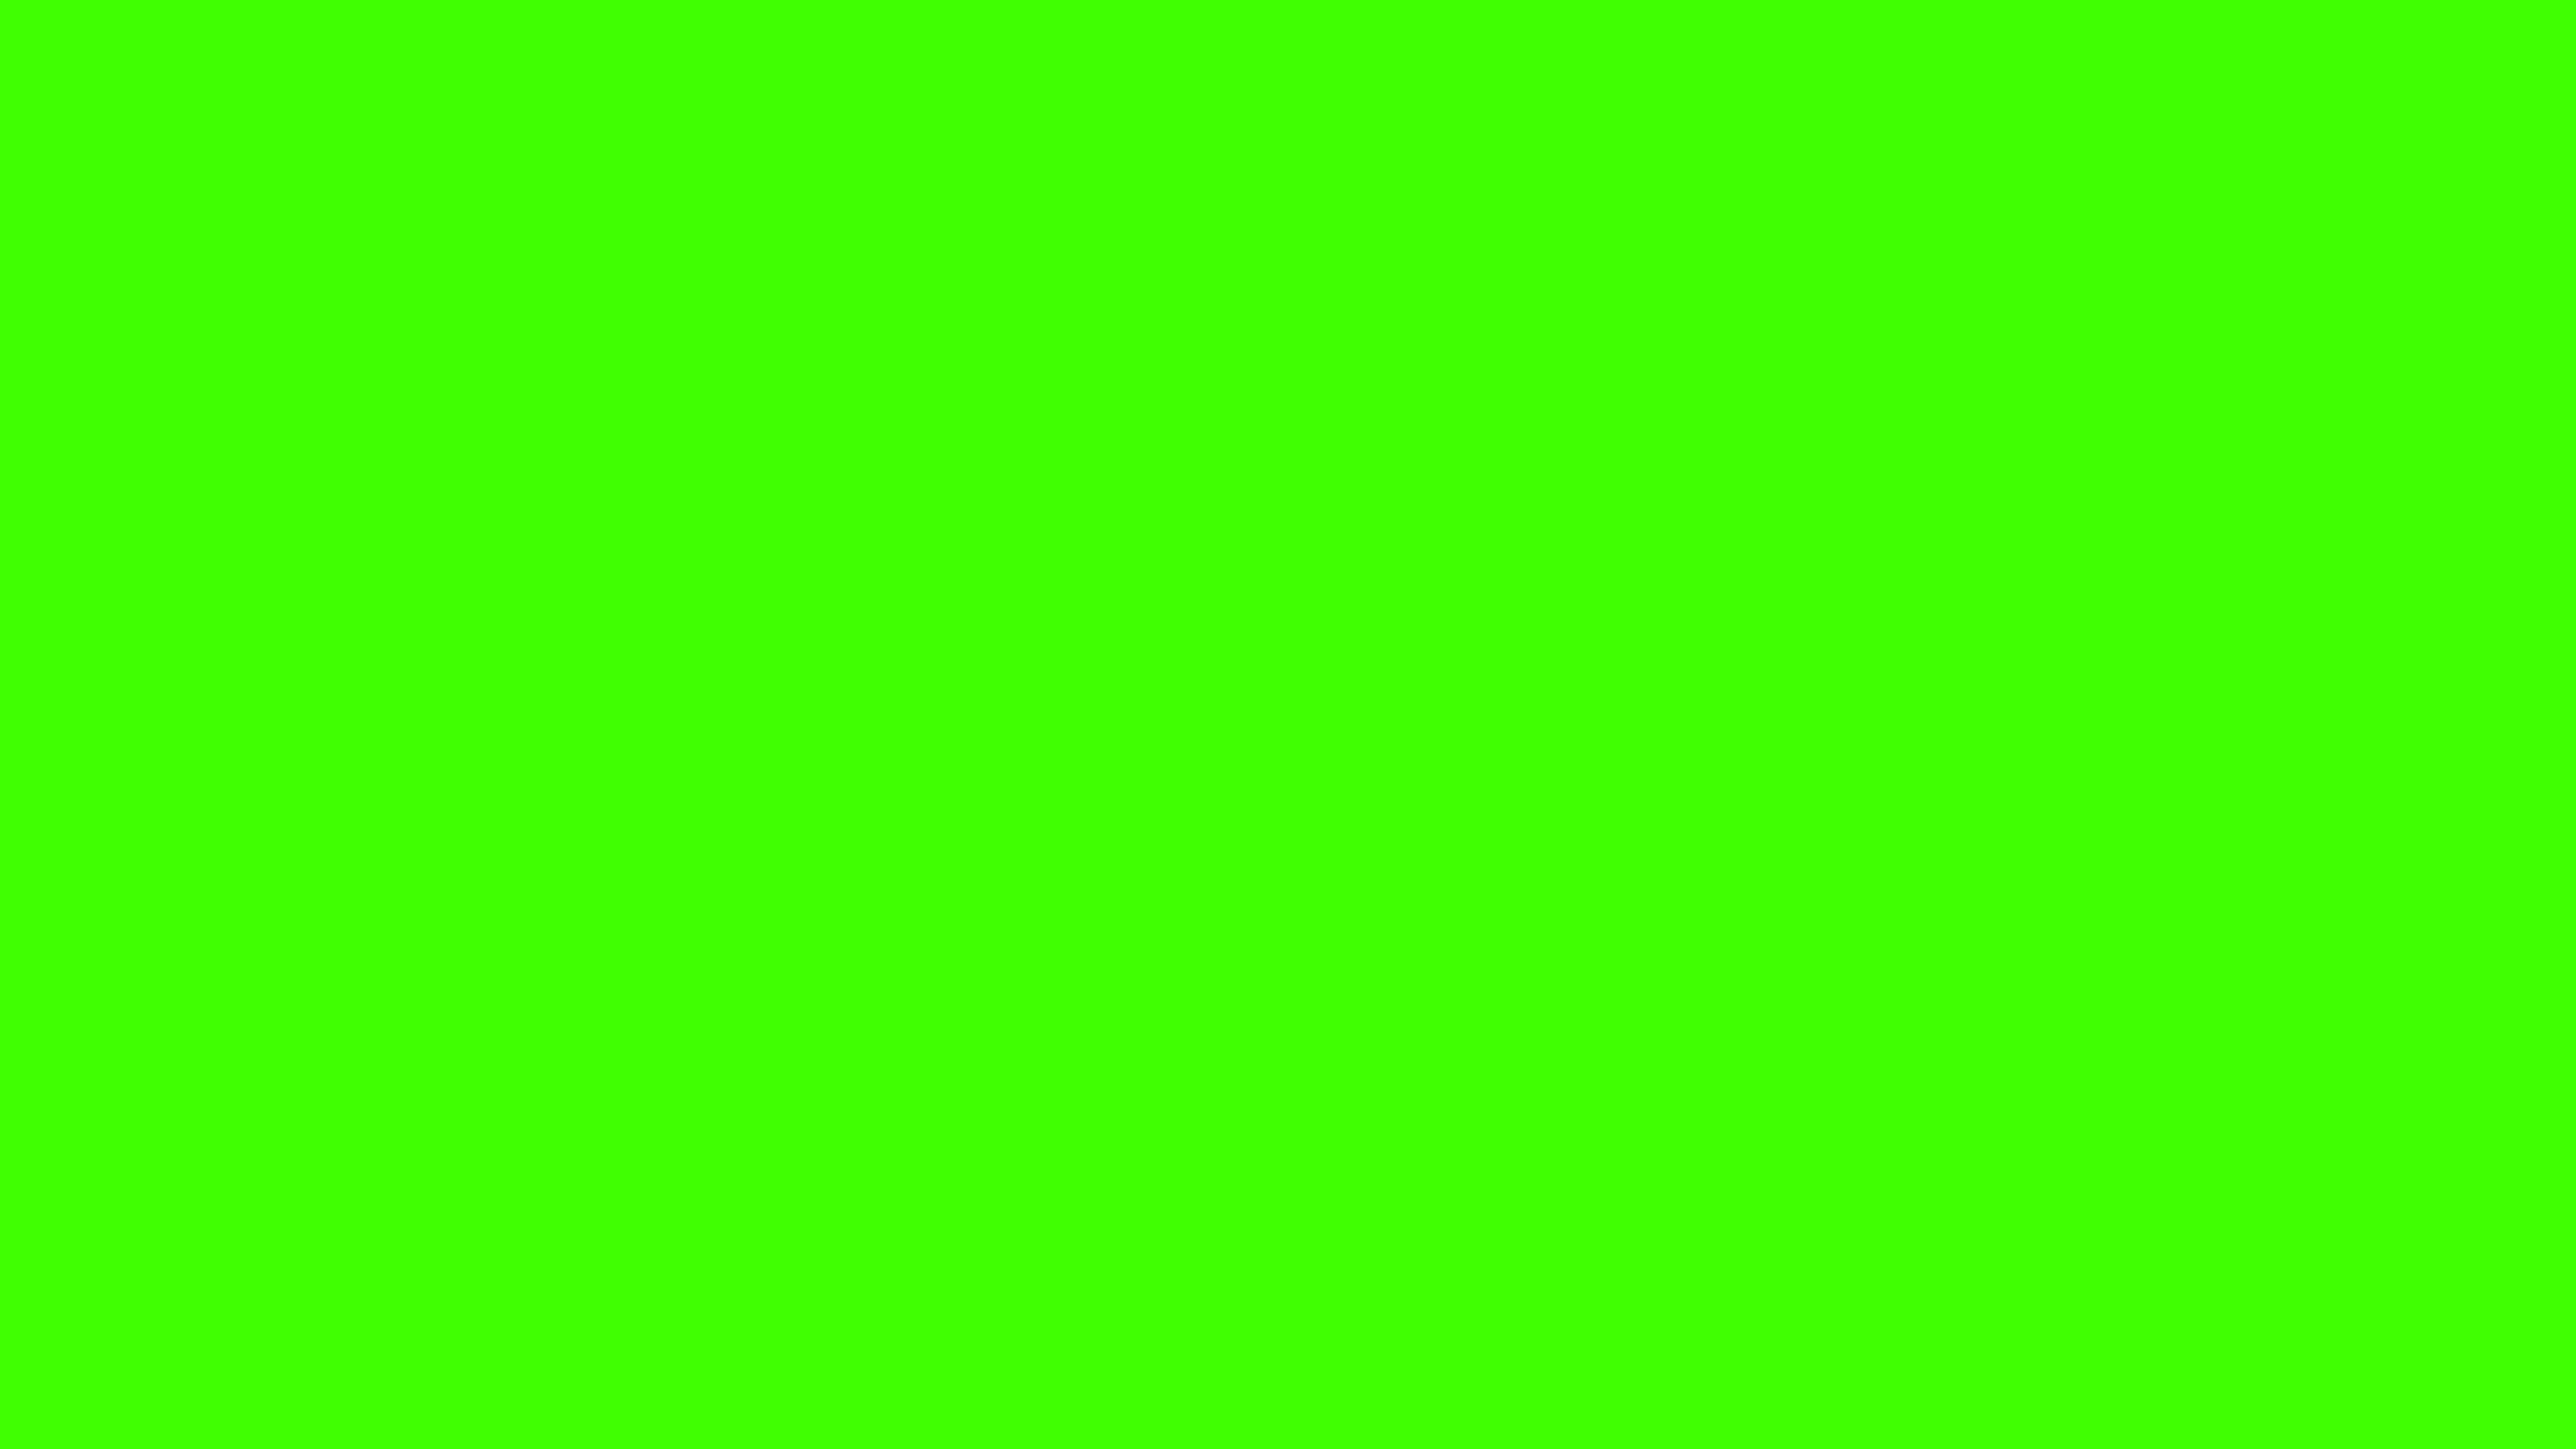 4096x2304 Harlequin Solid Color Background